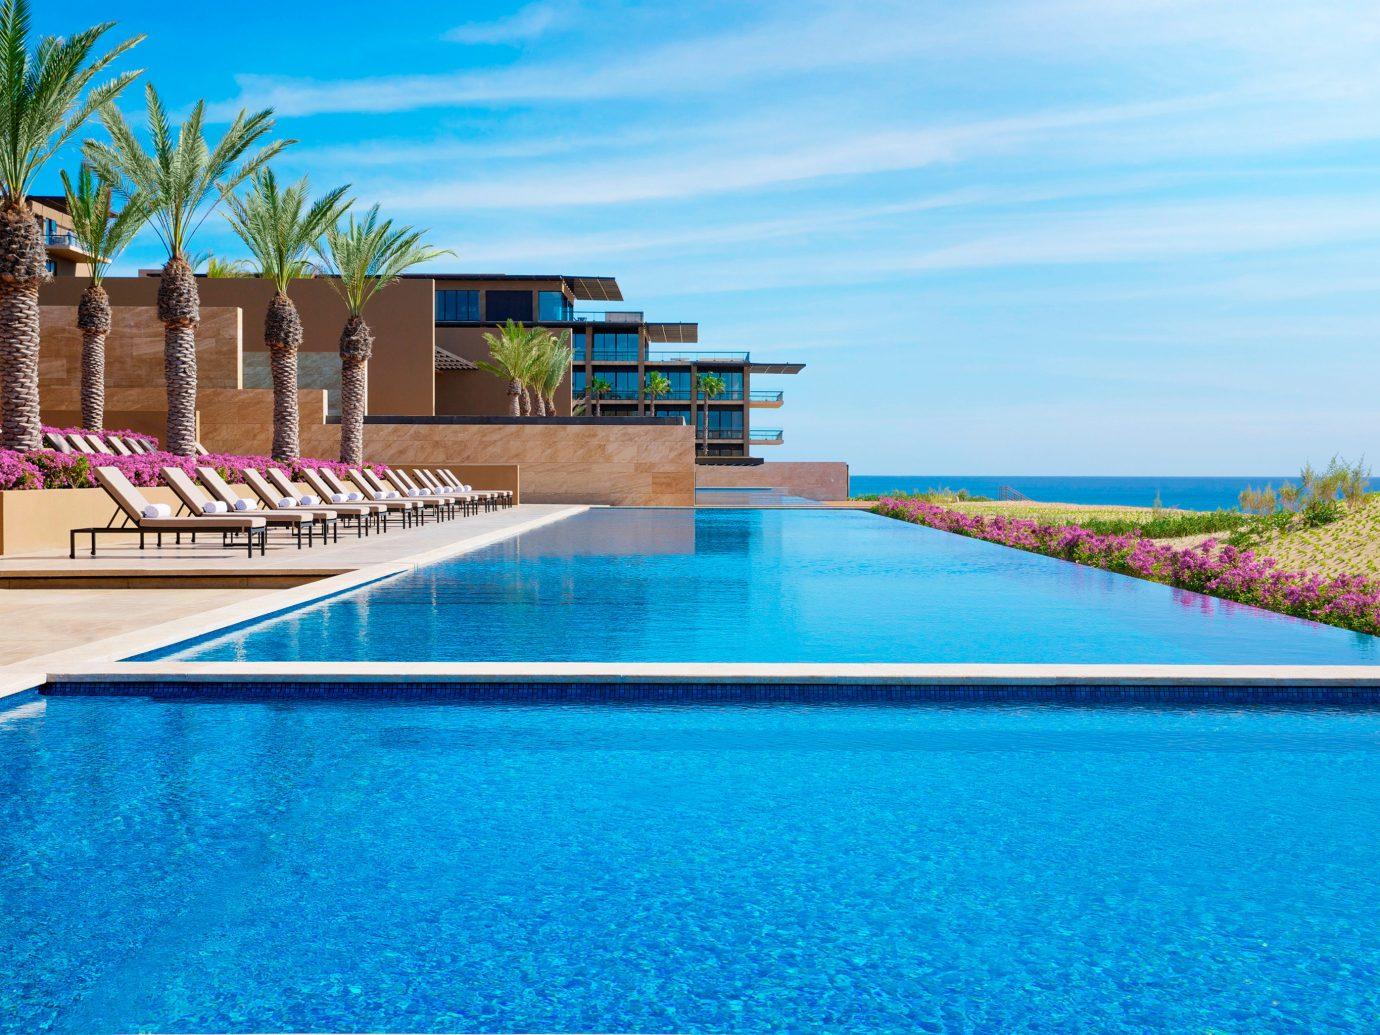 Budget Hotels sky water swimming pool leisure Pool property estate Resort vacation blue reflecting pool Villa Sea condominium bay swimming